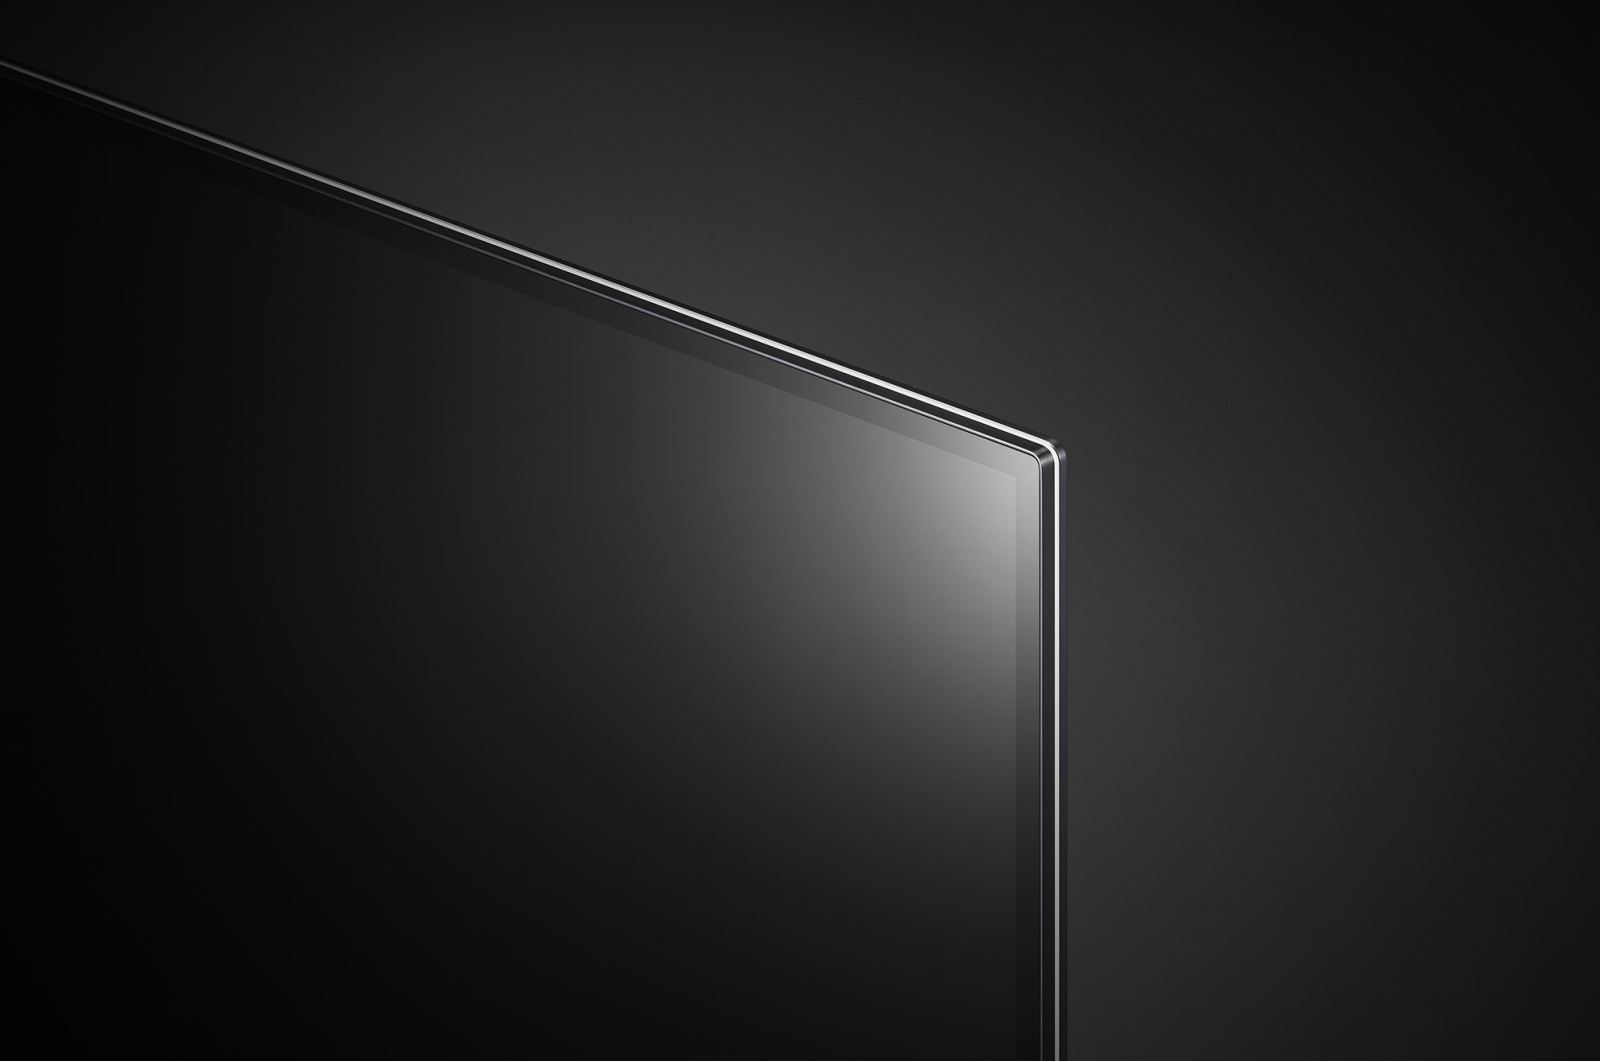 LG TV-OLED-E9 design